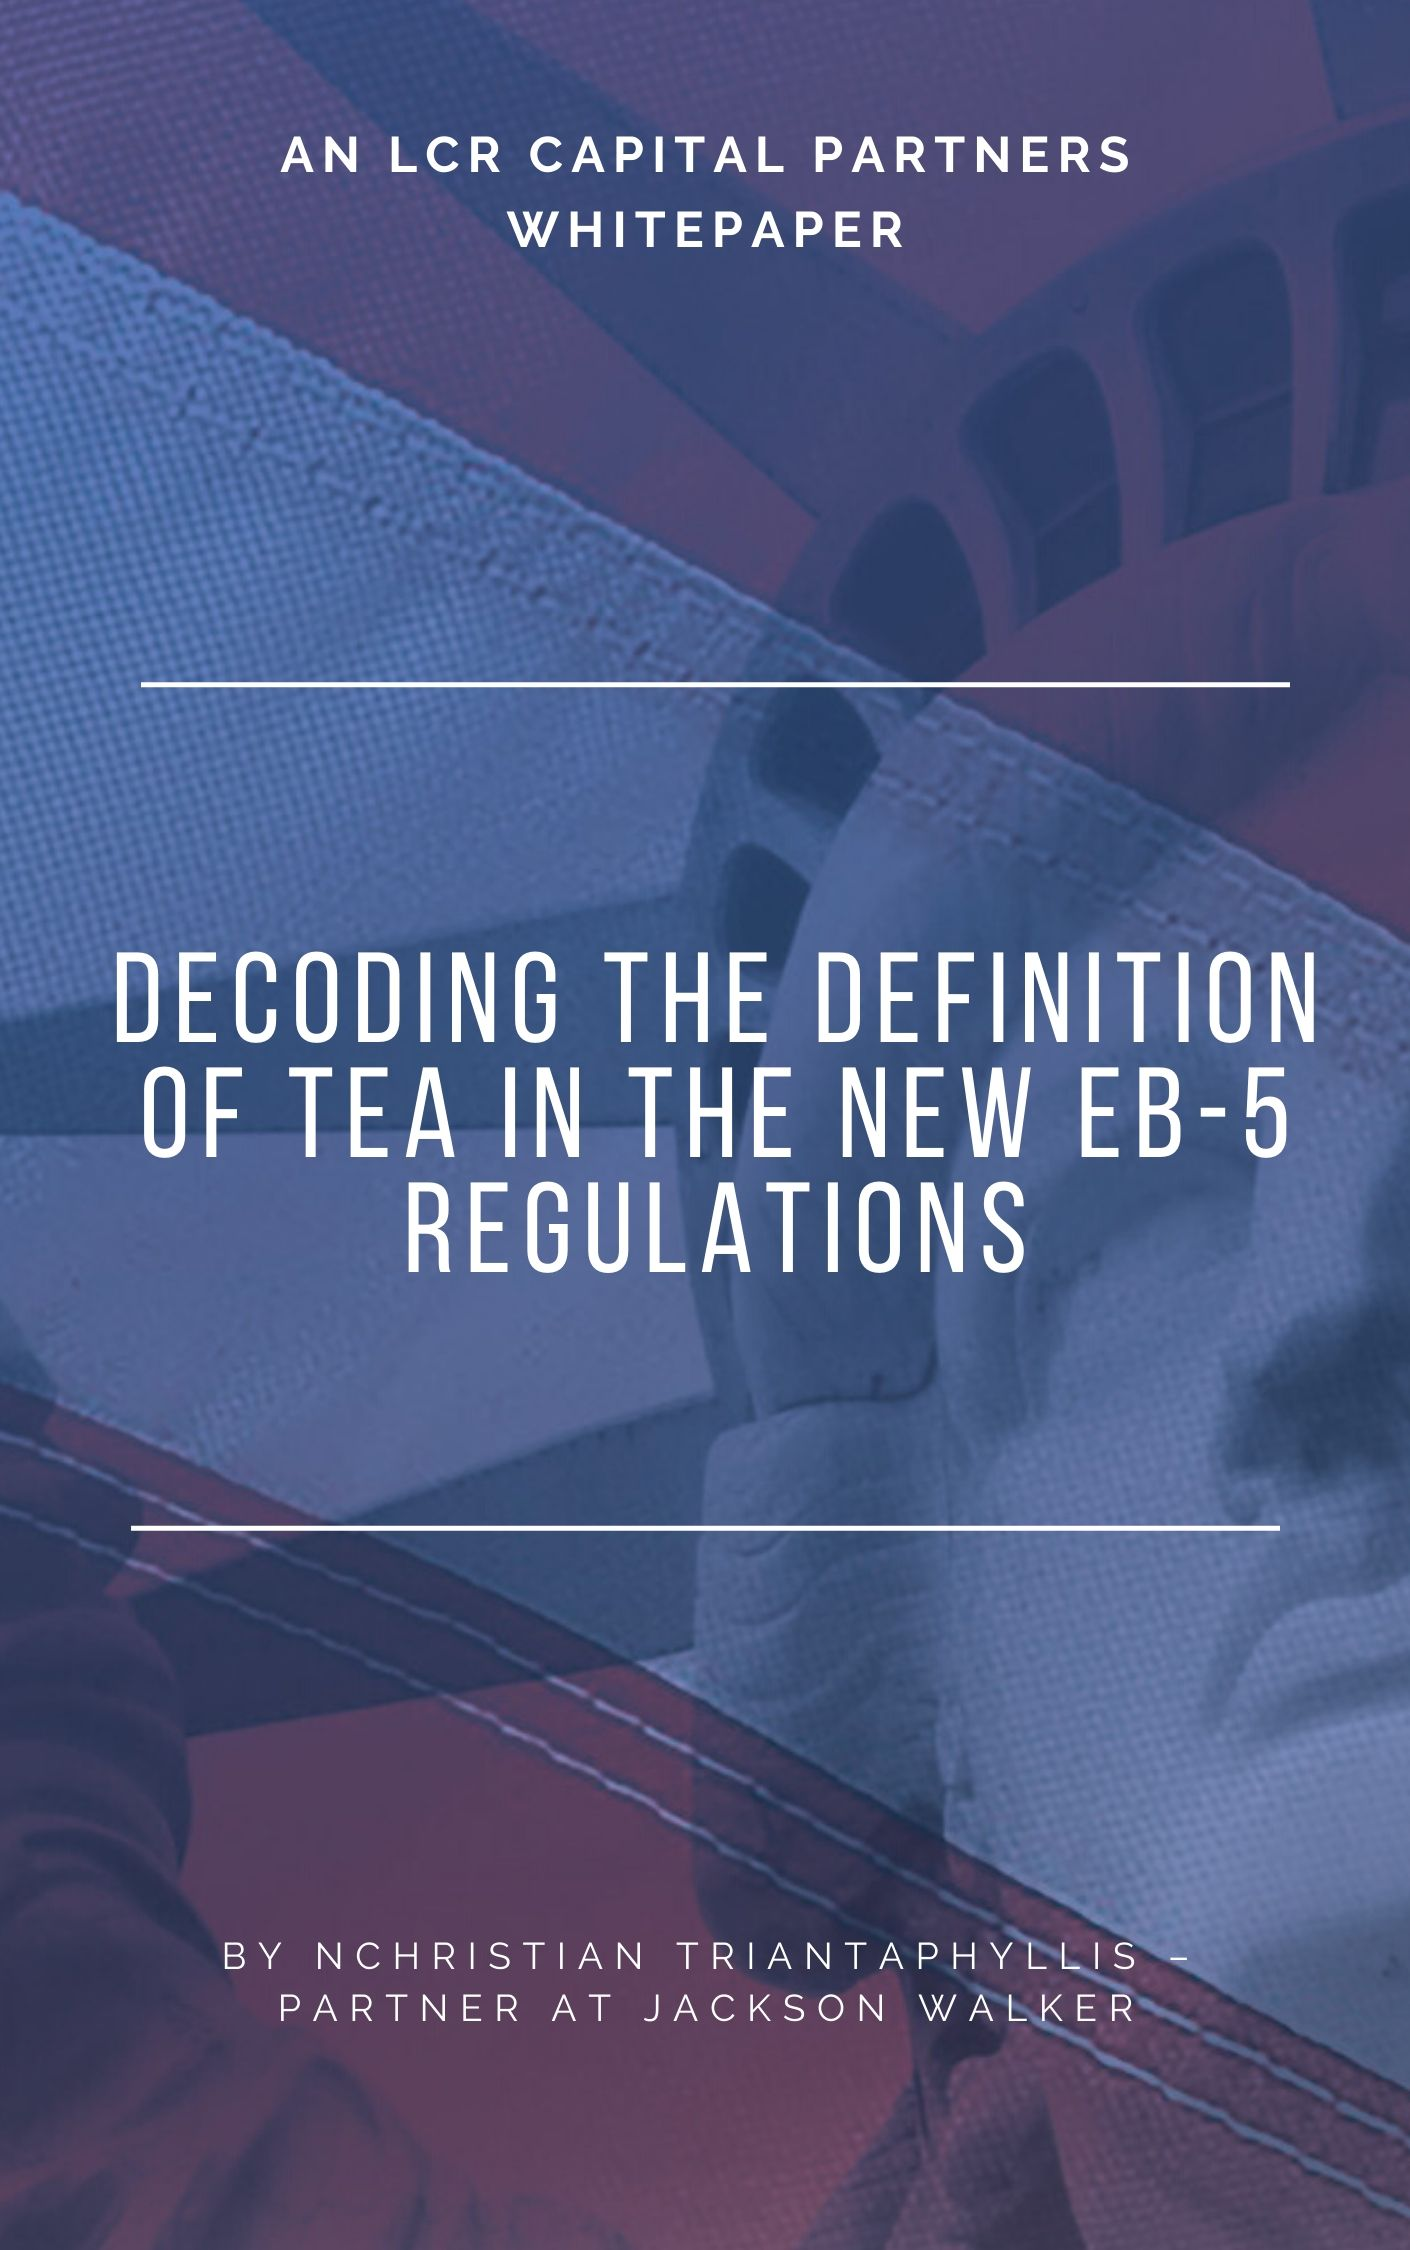 definition-of-tea-whitepaper